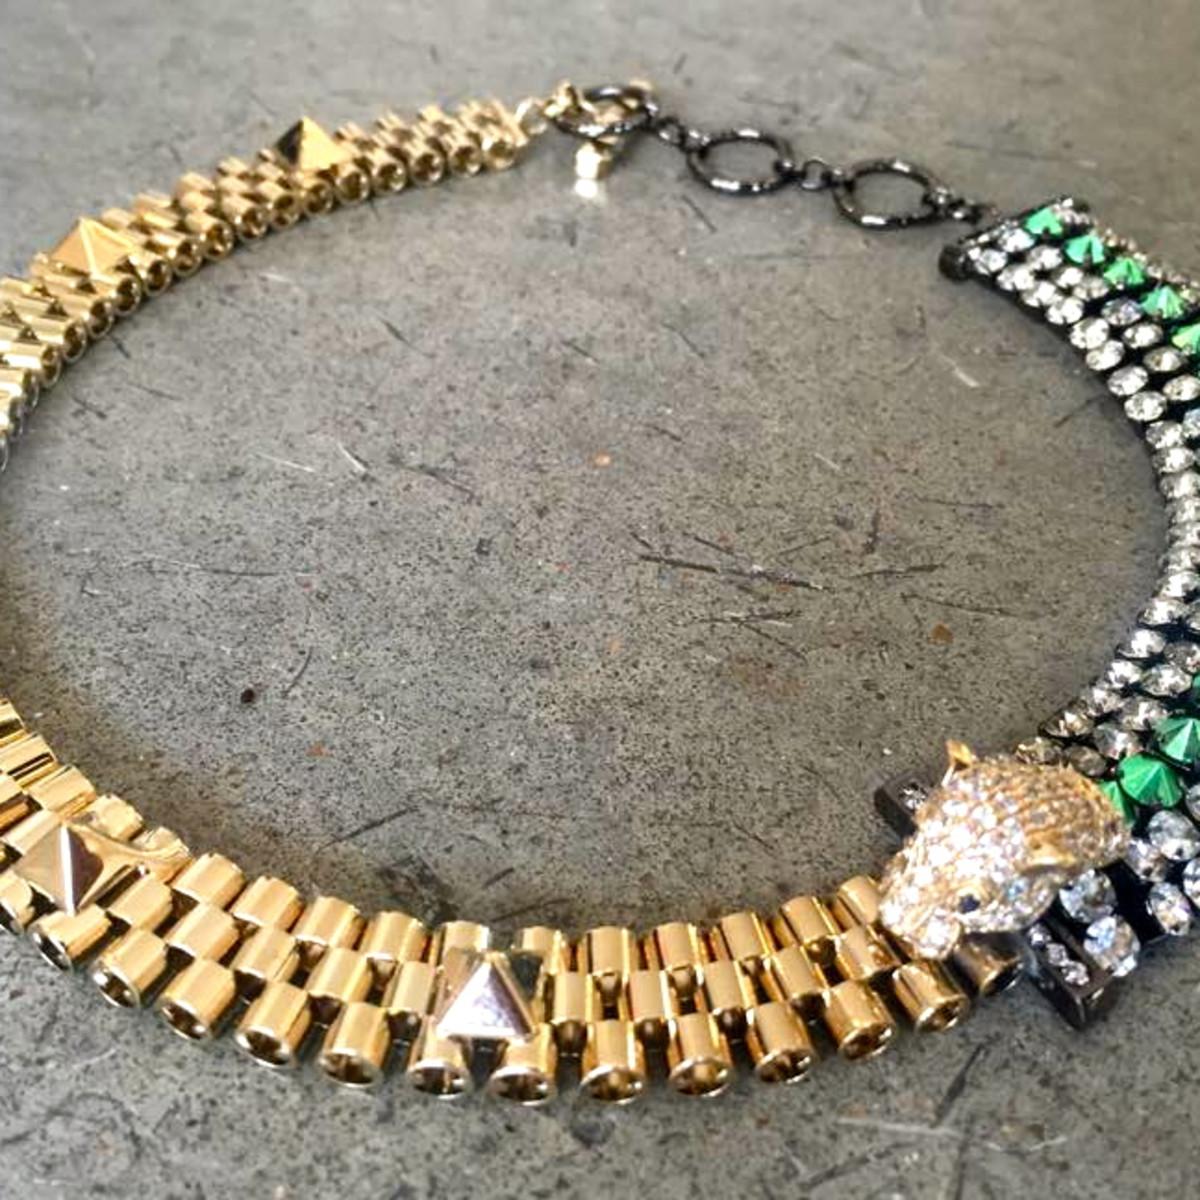 Houston, Sloan Hall, Ioselliani necklace, July 2015